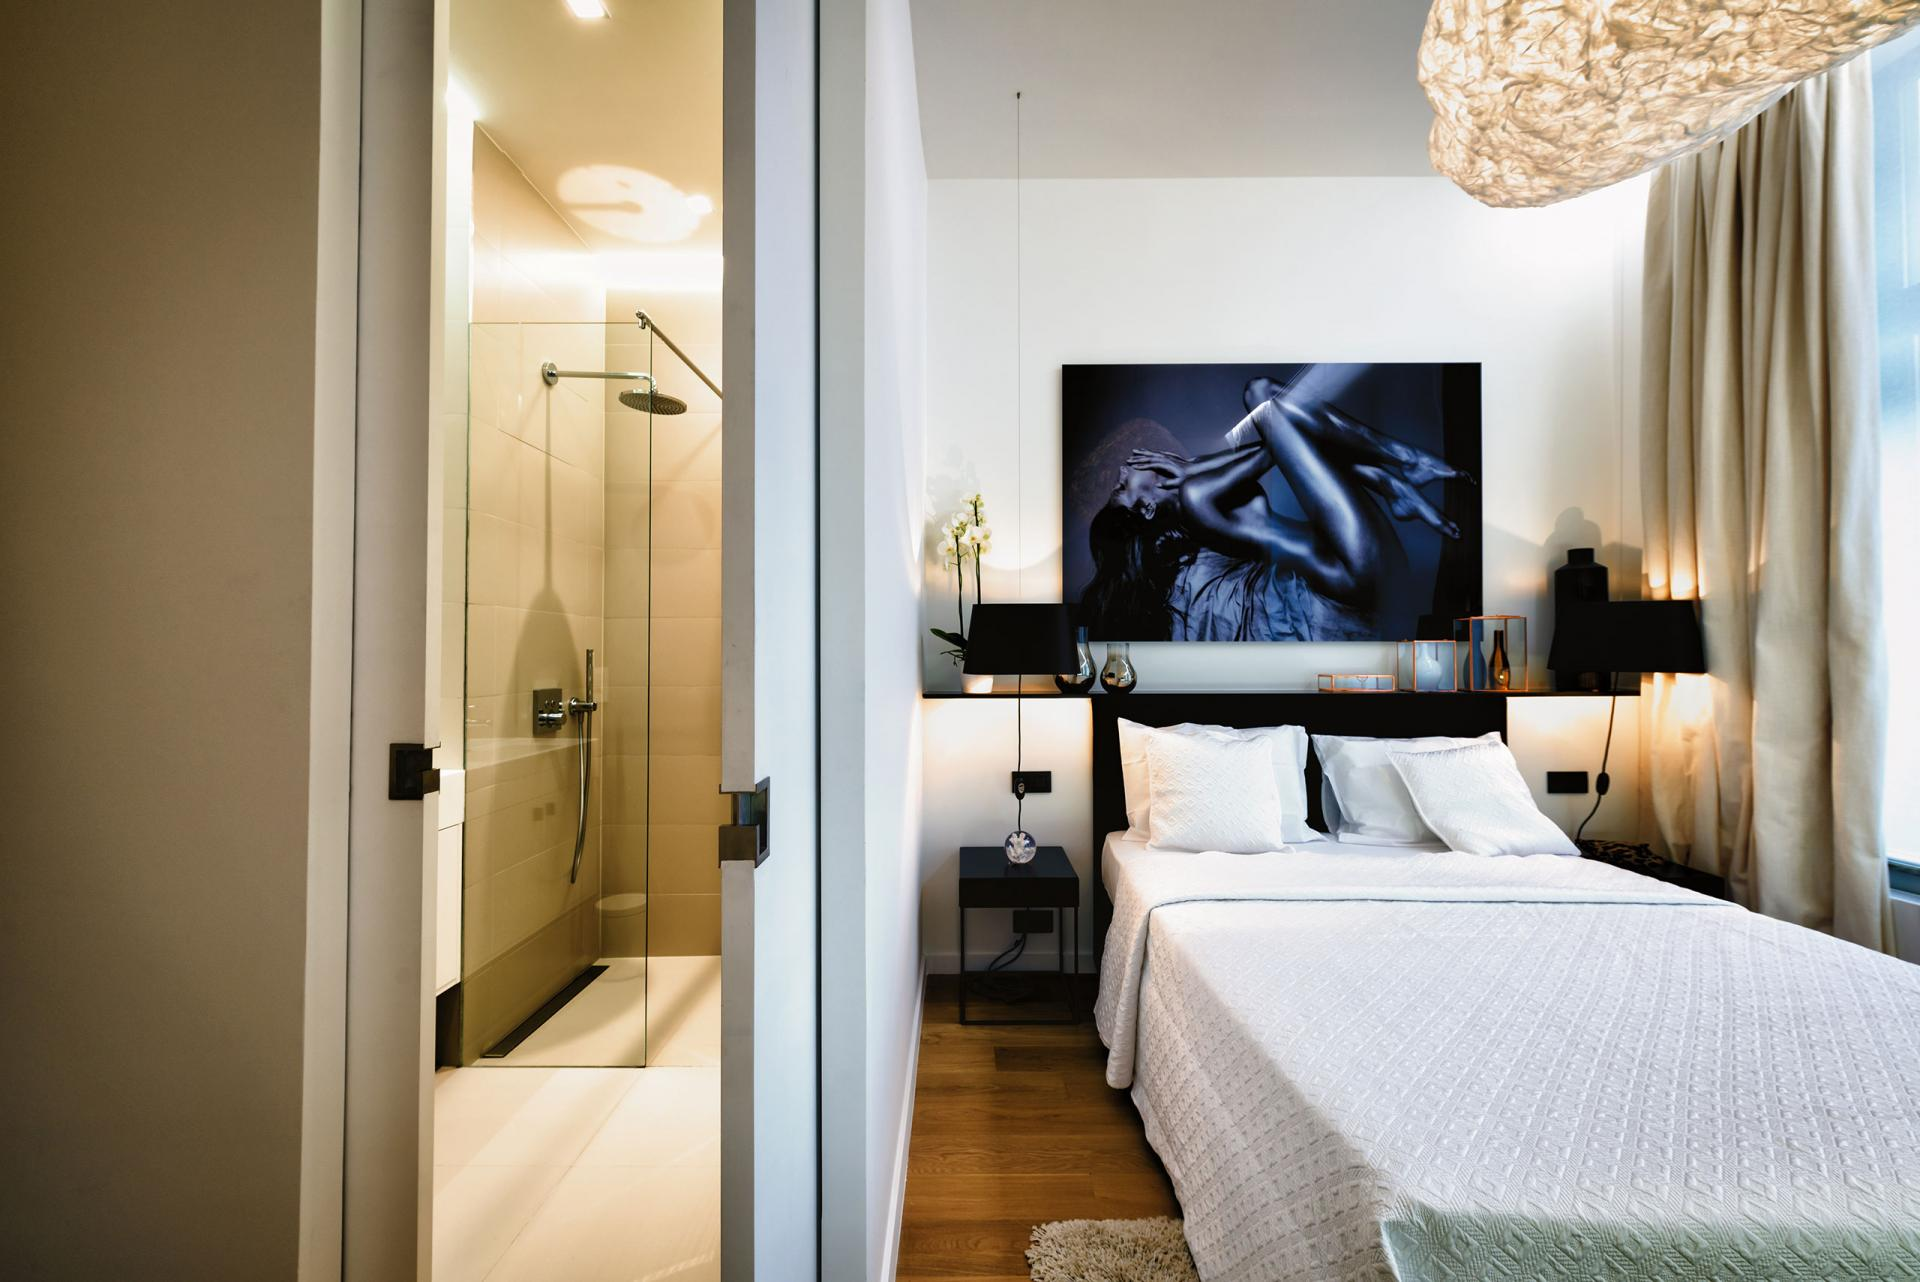 Bathroom / Bedroom 1 at Amazone Charles Apartments - Citybase Apartments